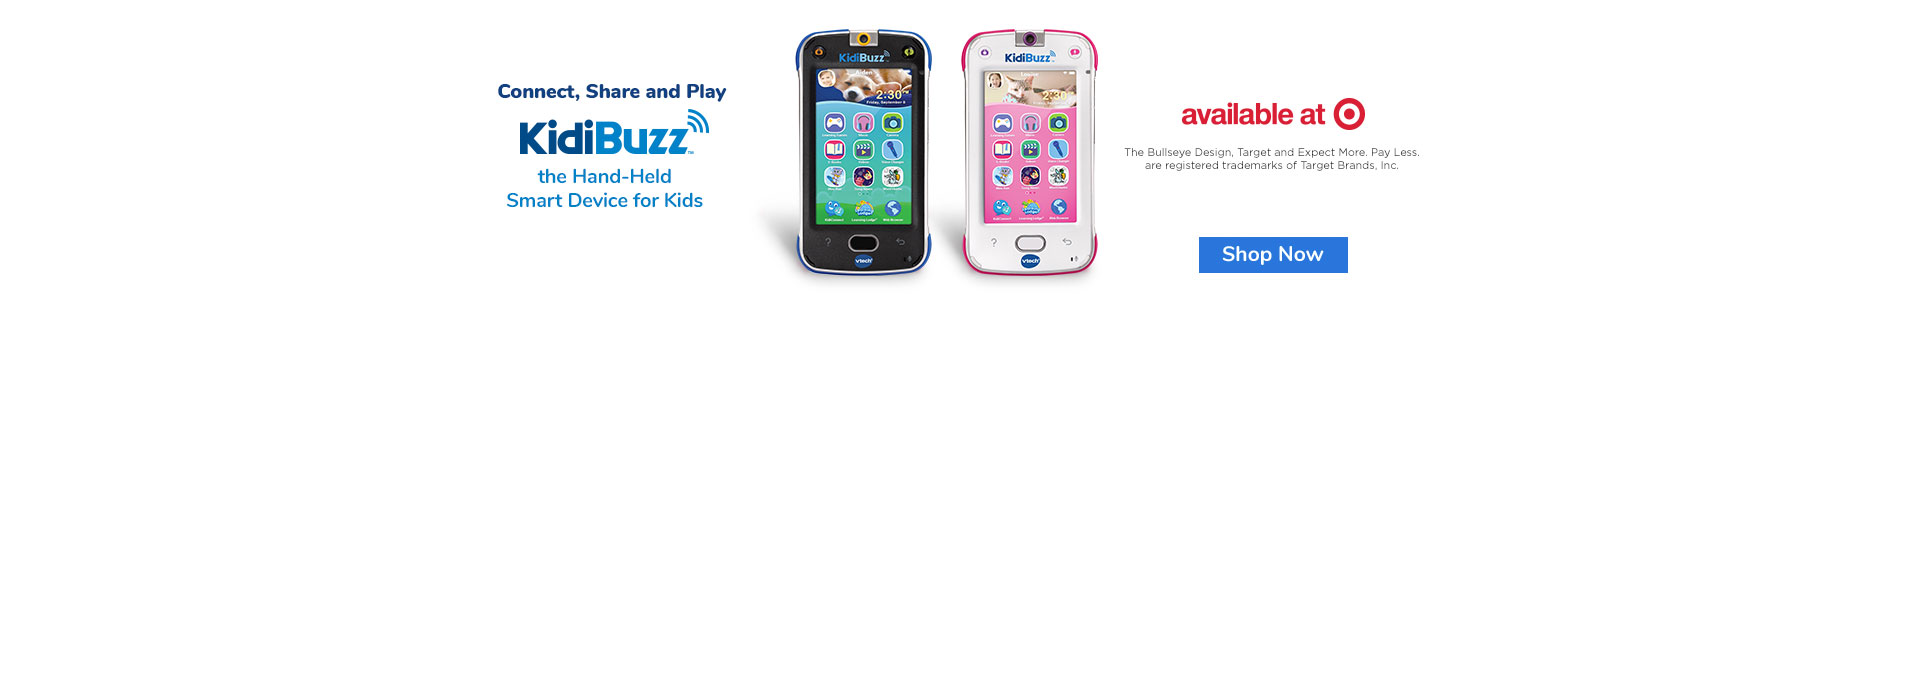 KidiBuzz, Buy Now at Target